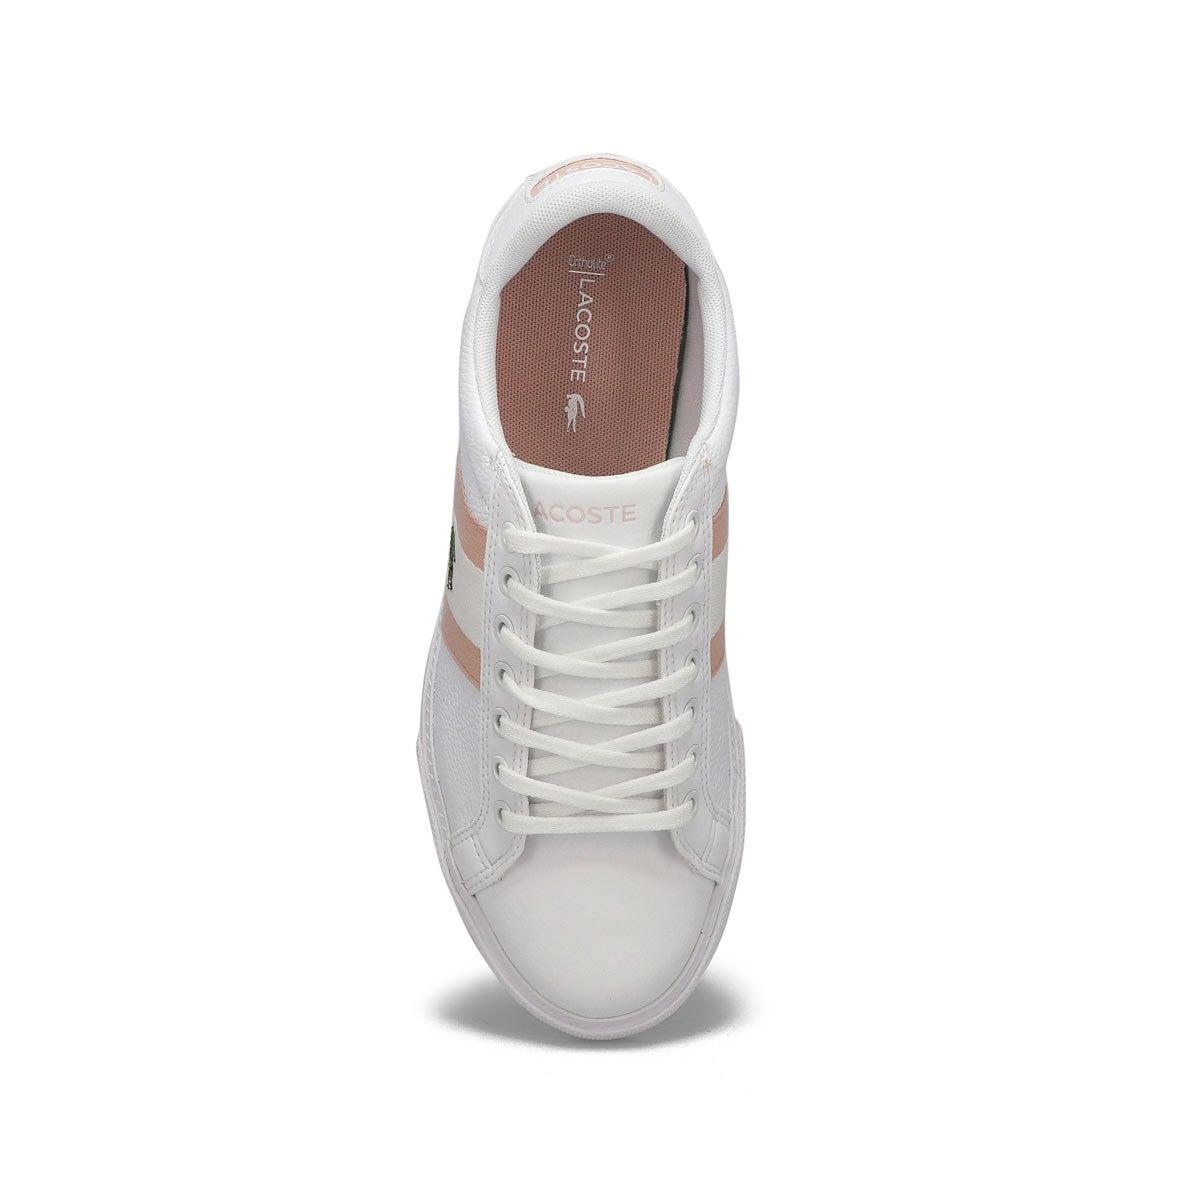 Lds Grad Vulc 120 1 wht/pnk sneaker